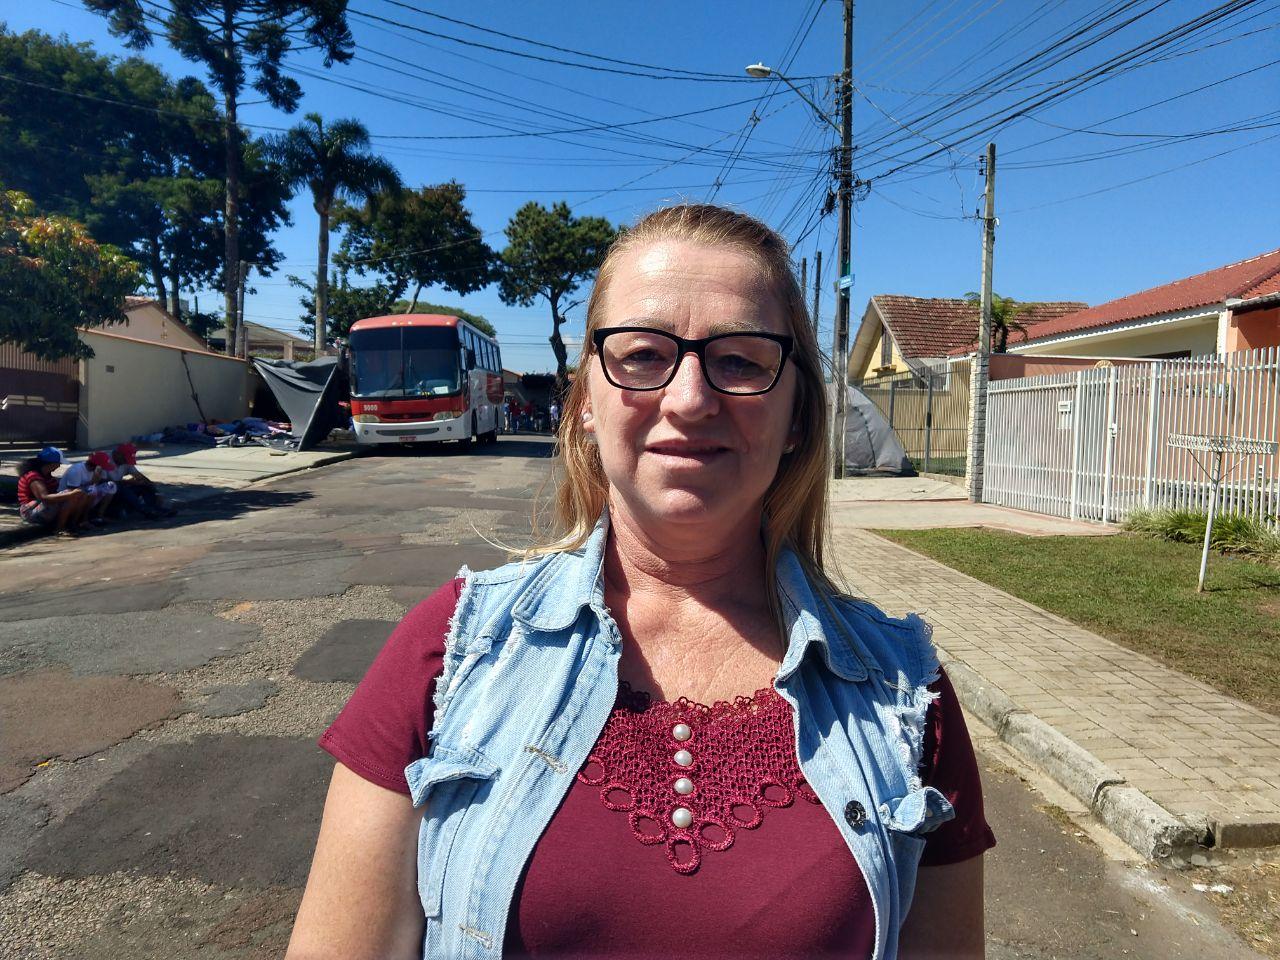 A agricultura Lizete Bernardi veio do Oeste catarinense para prestar solidariedade ao ex-presidente Lula. / foto: Franciele Petry